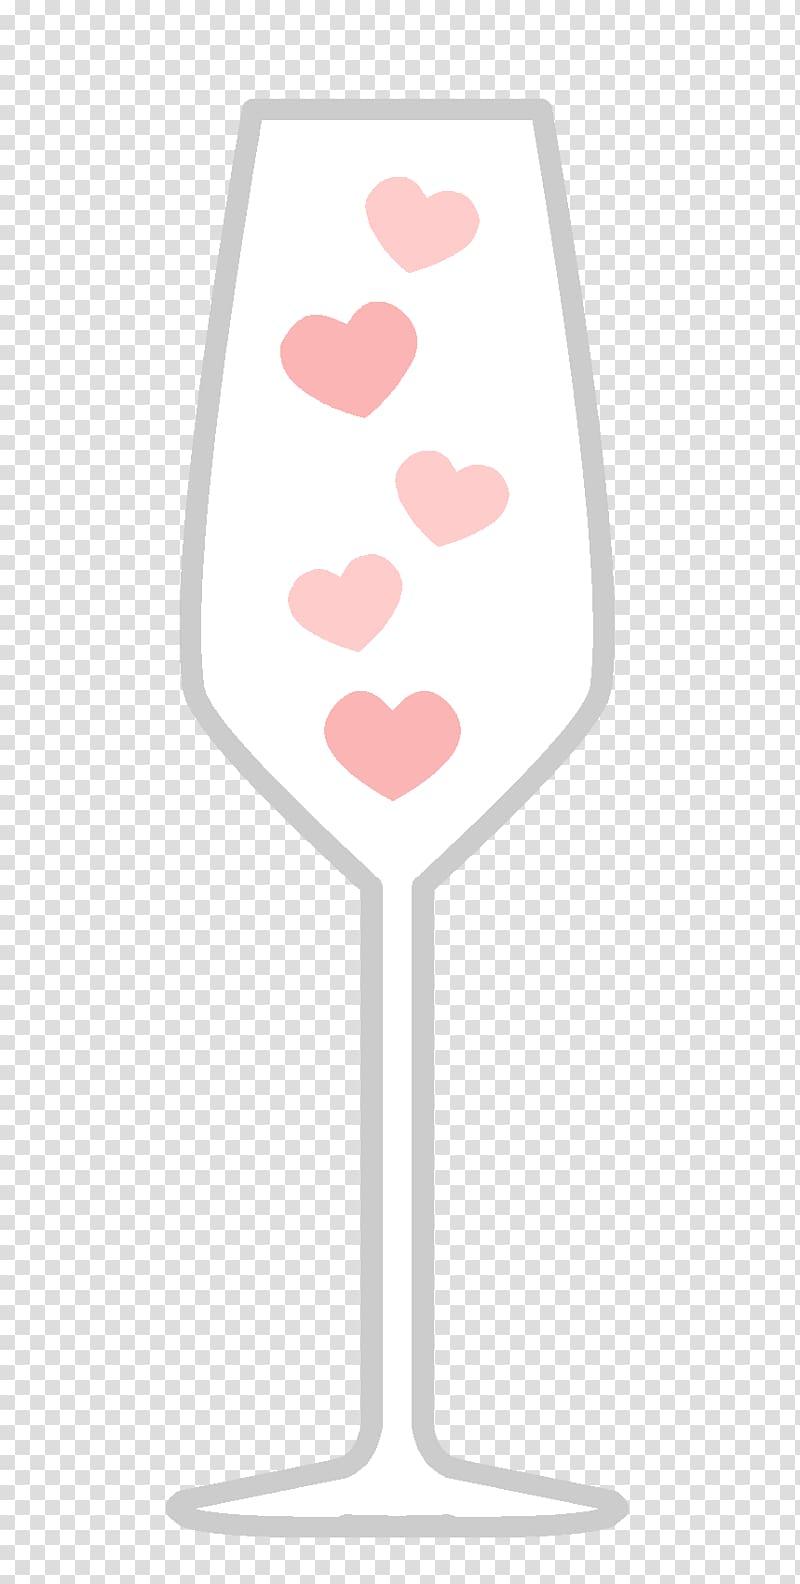 Wine glass Champagne glass Pink M Font, glass transparent.